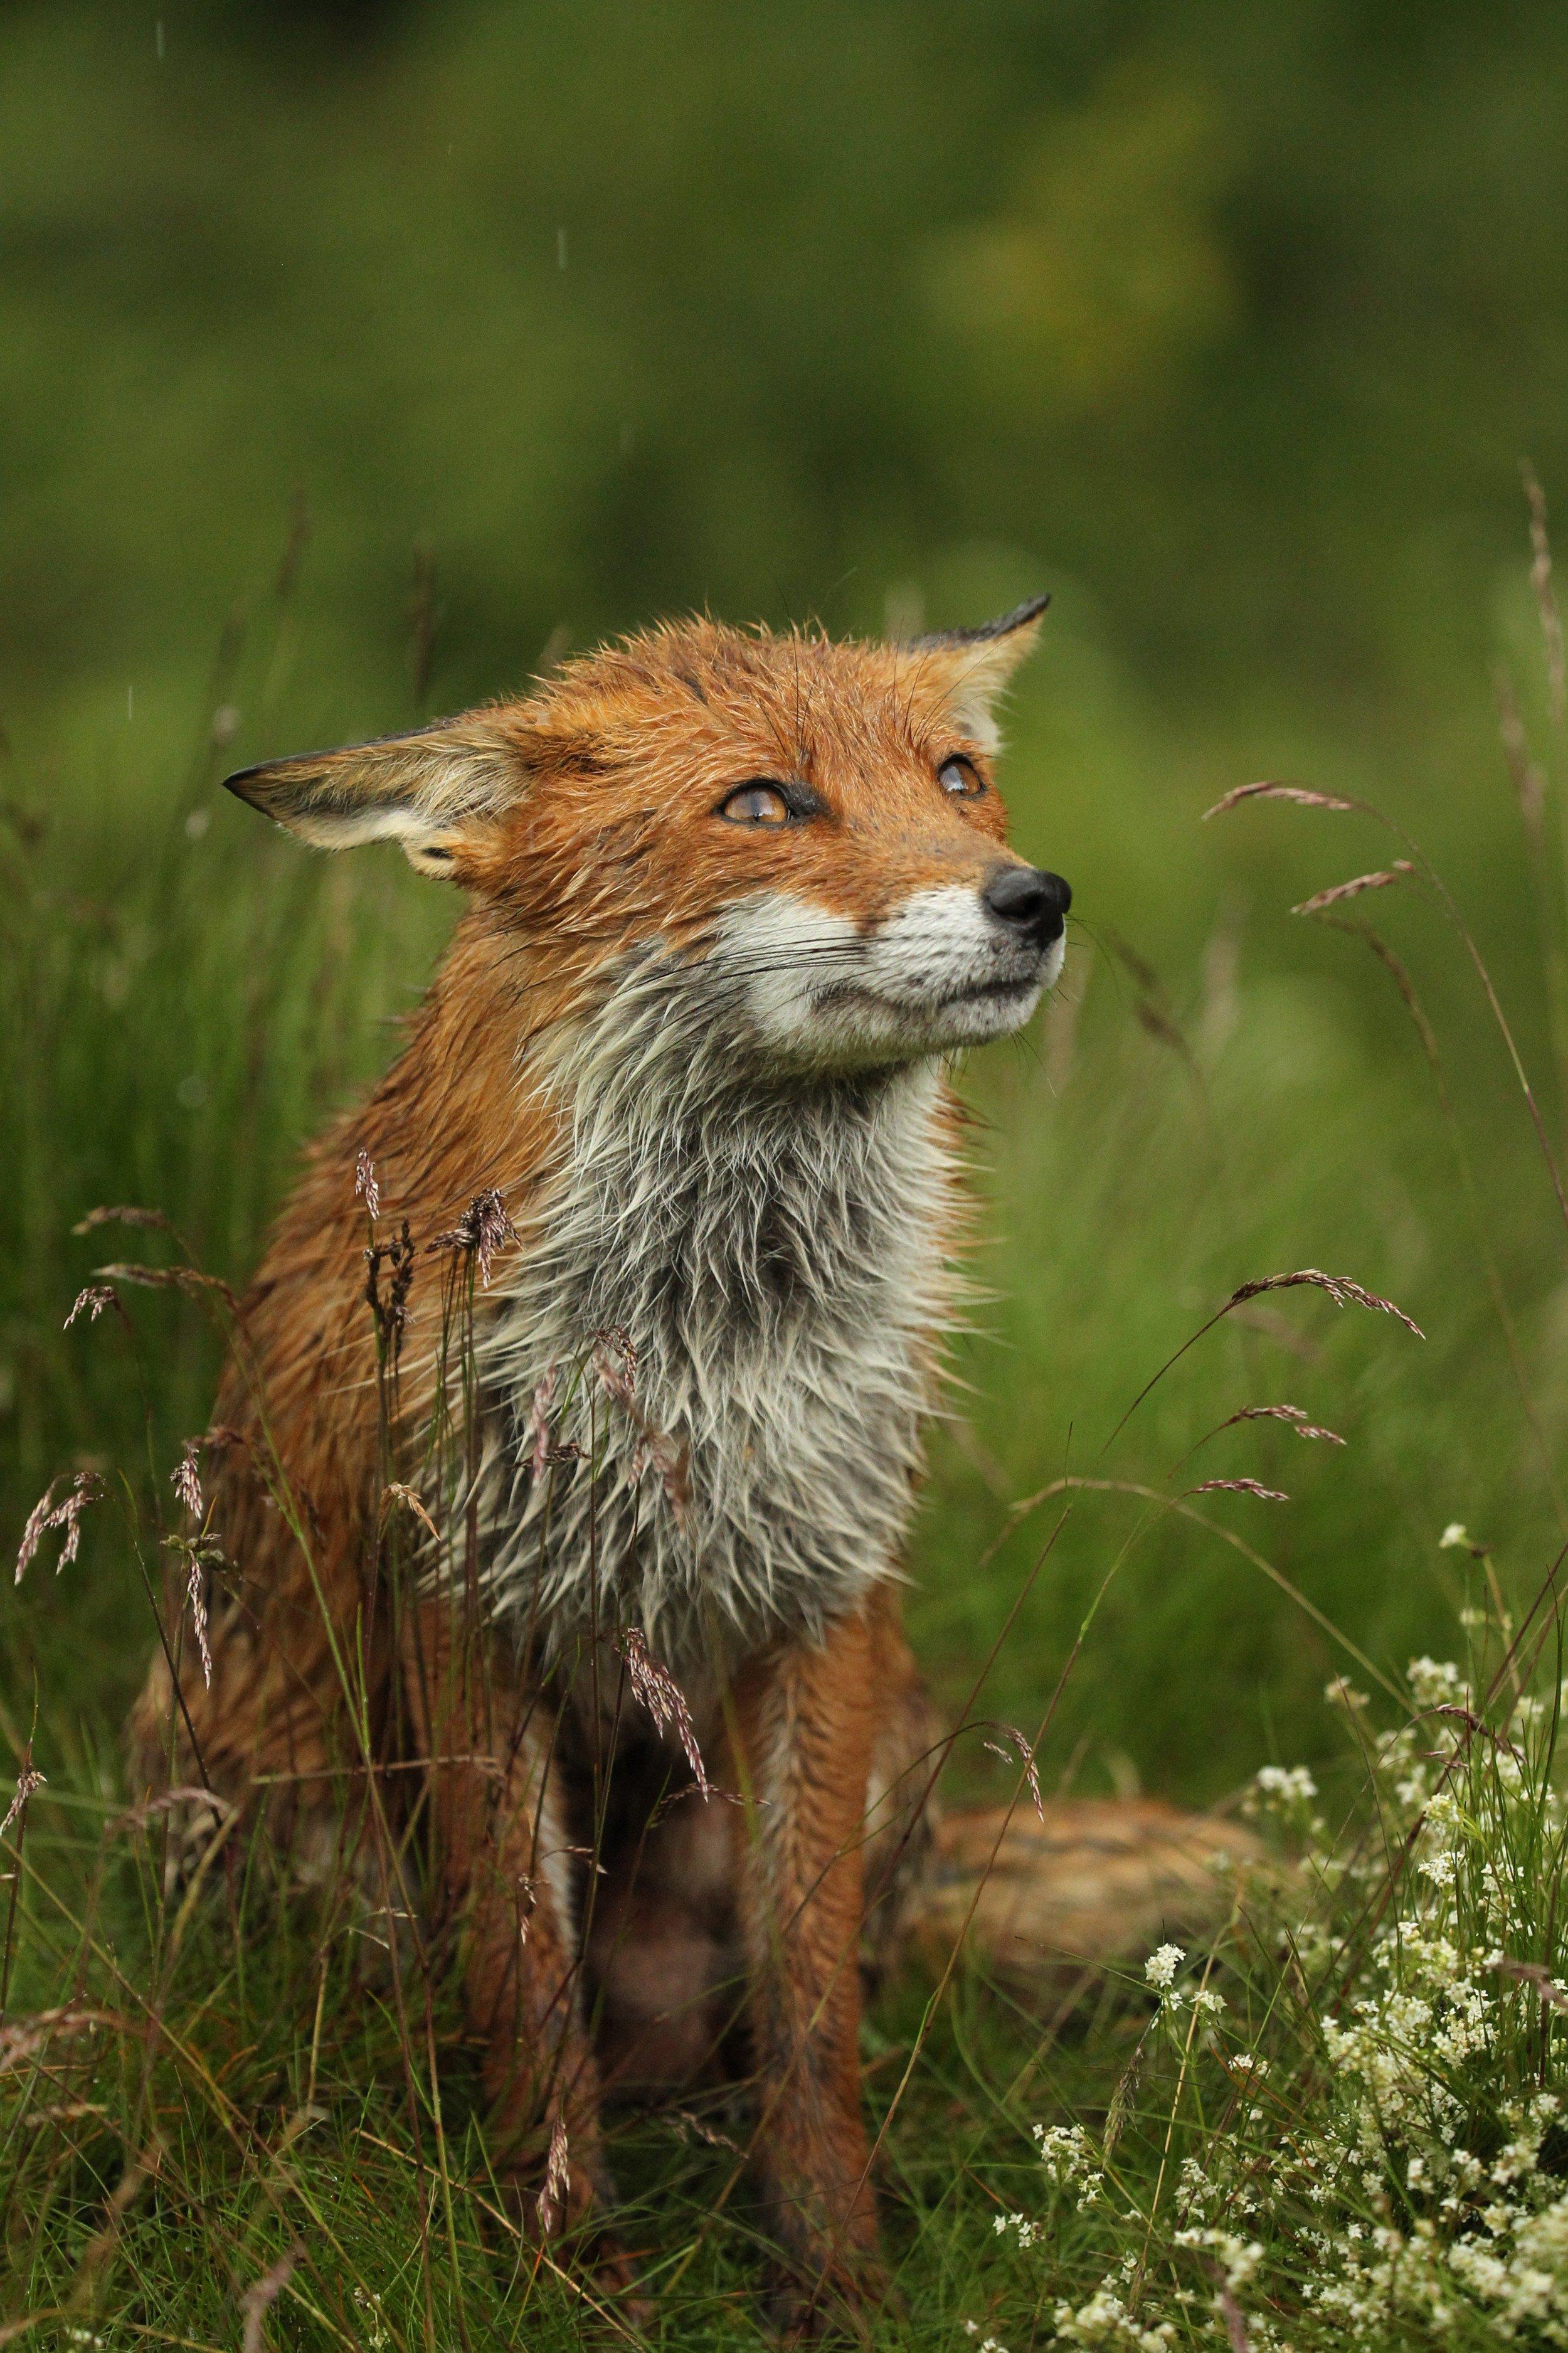 wildlife_photography_7.jpg